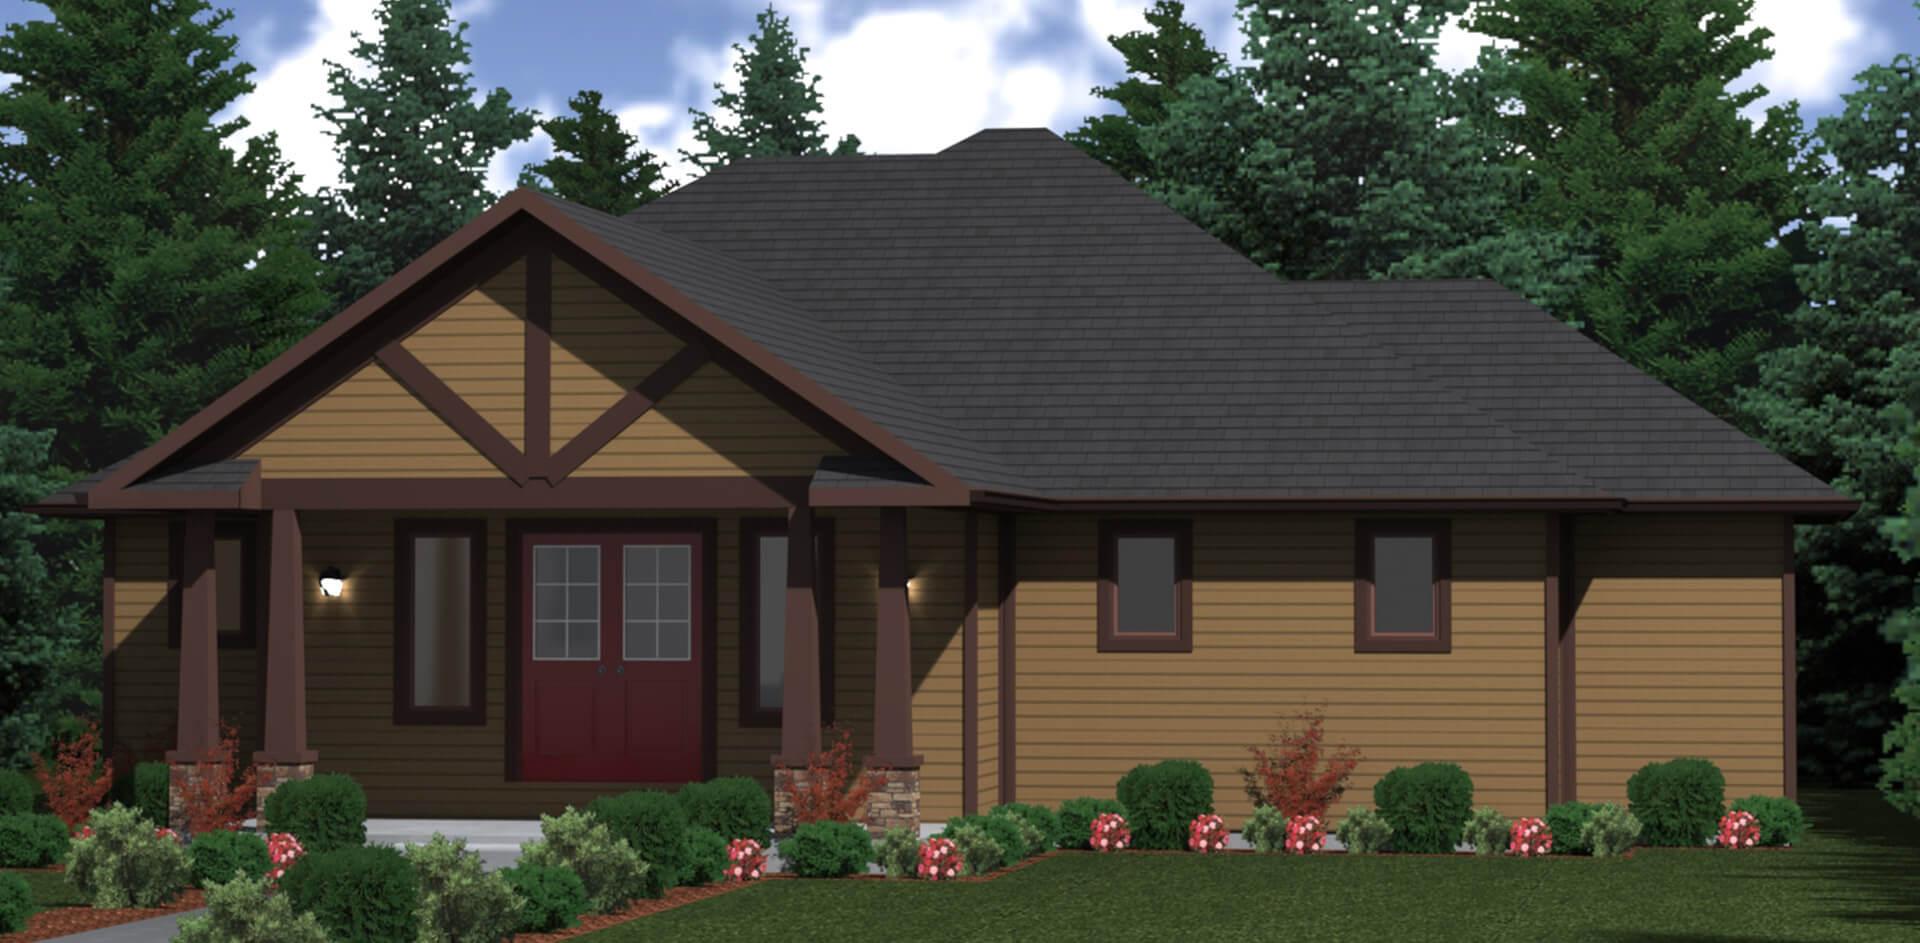 1385 house elevation